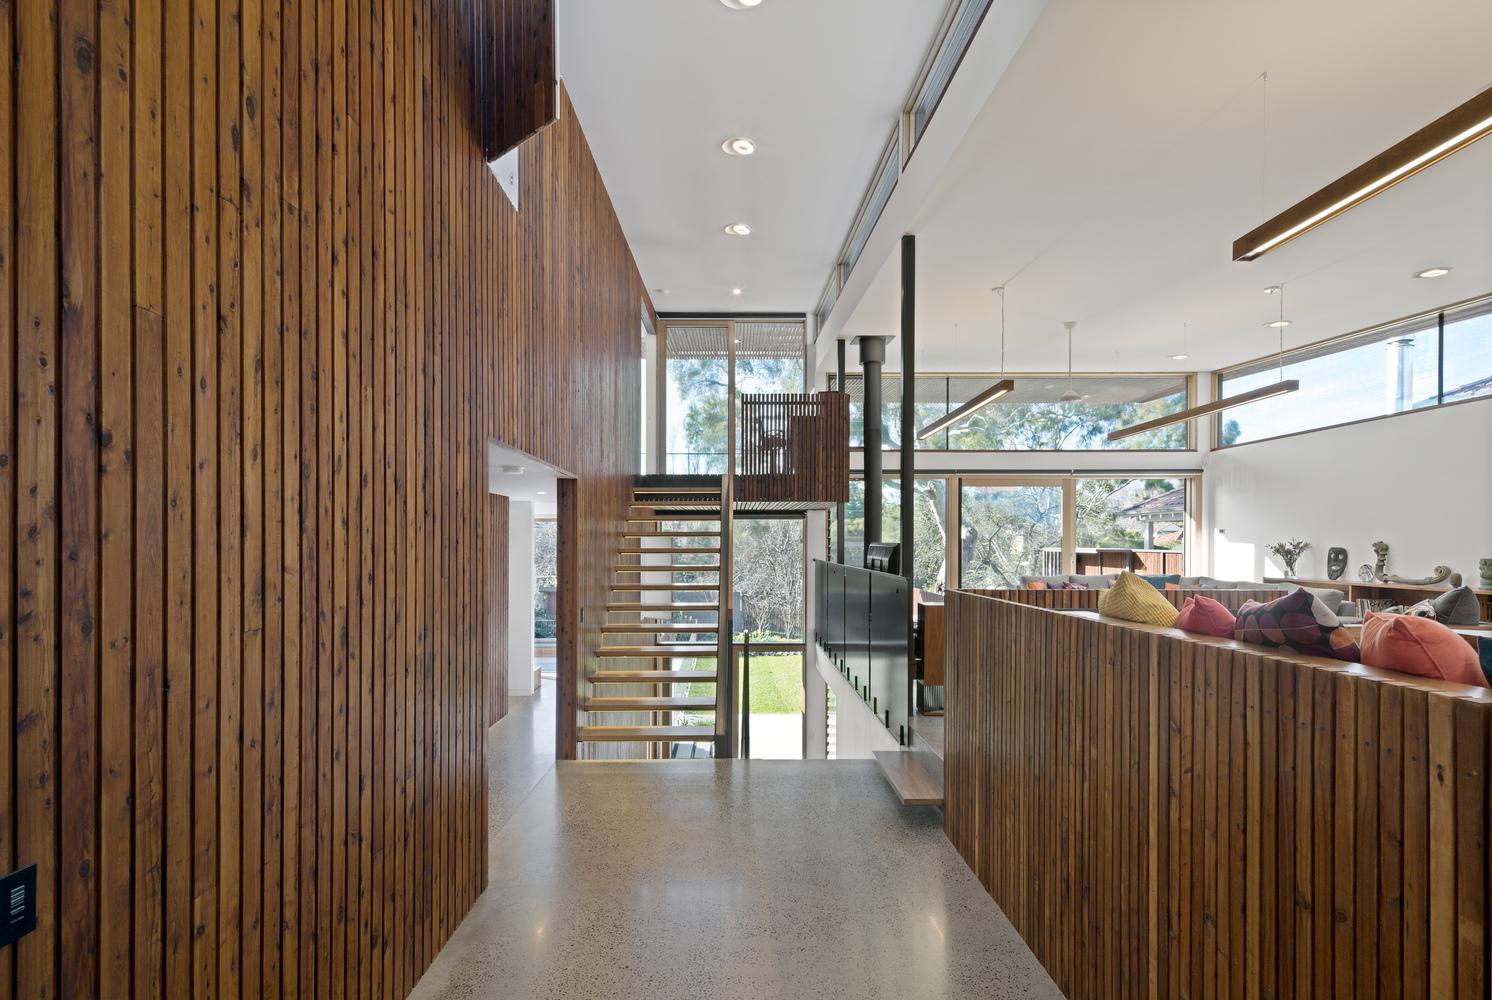 4_Trail House _Zen Architects_Inspirationist